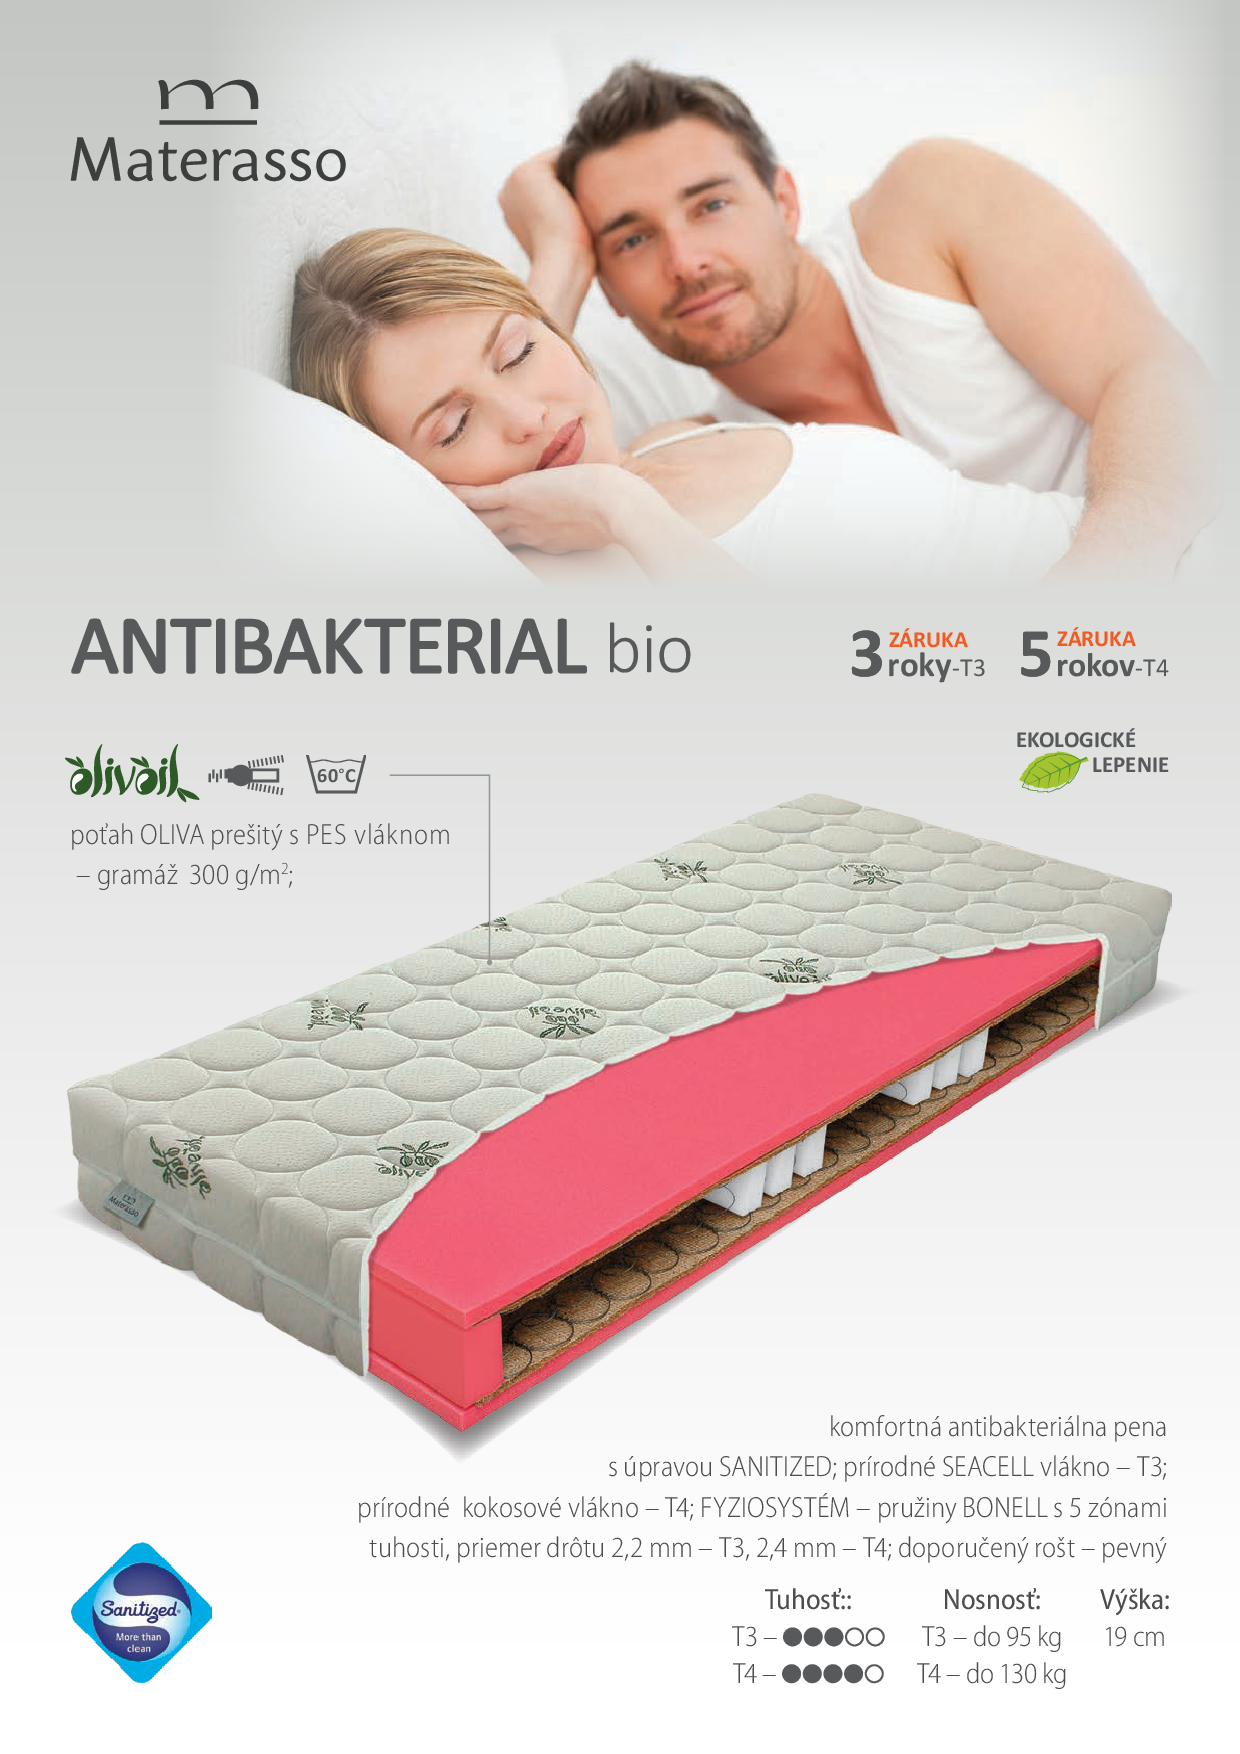 Antibakterial bio